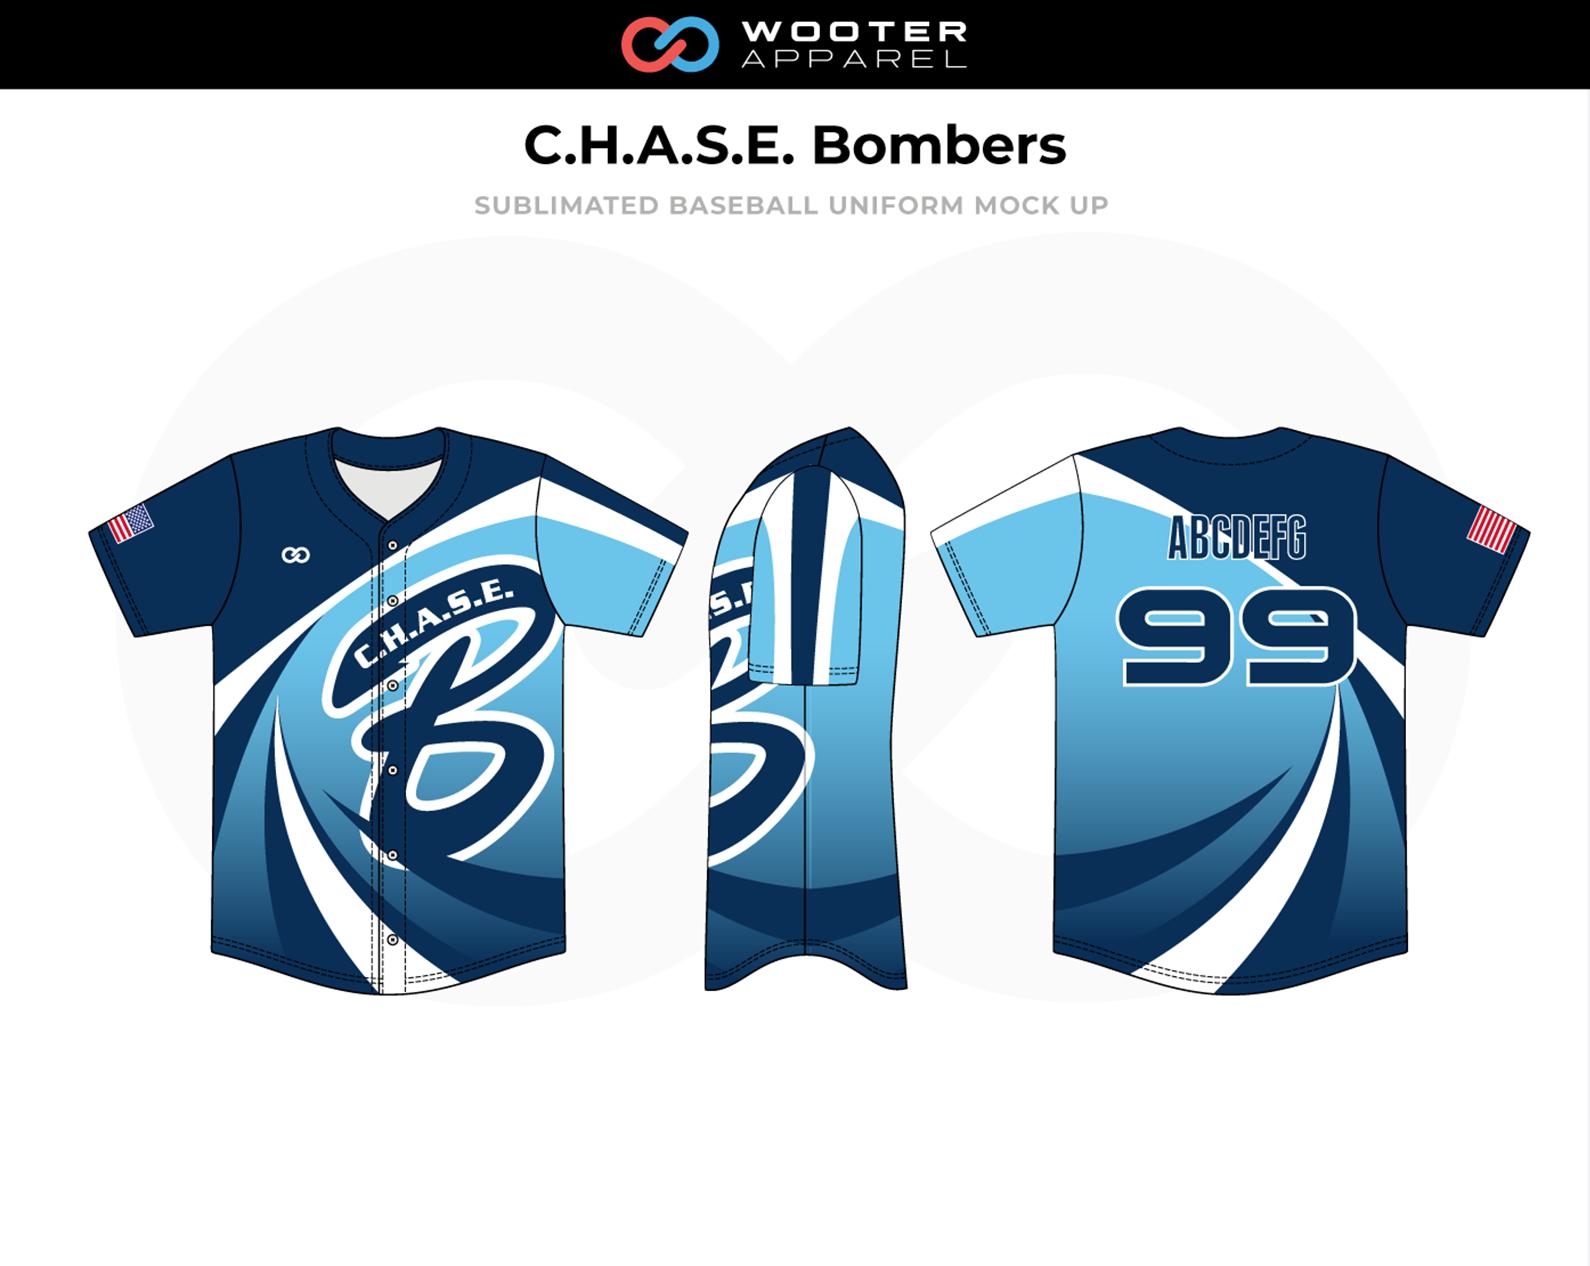 C.H.A.S.E.-Bombers-Sublimated-Baseball-Uniform_v2_2018.png